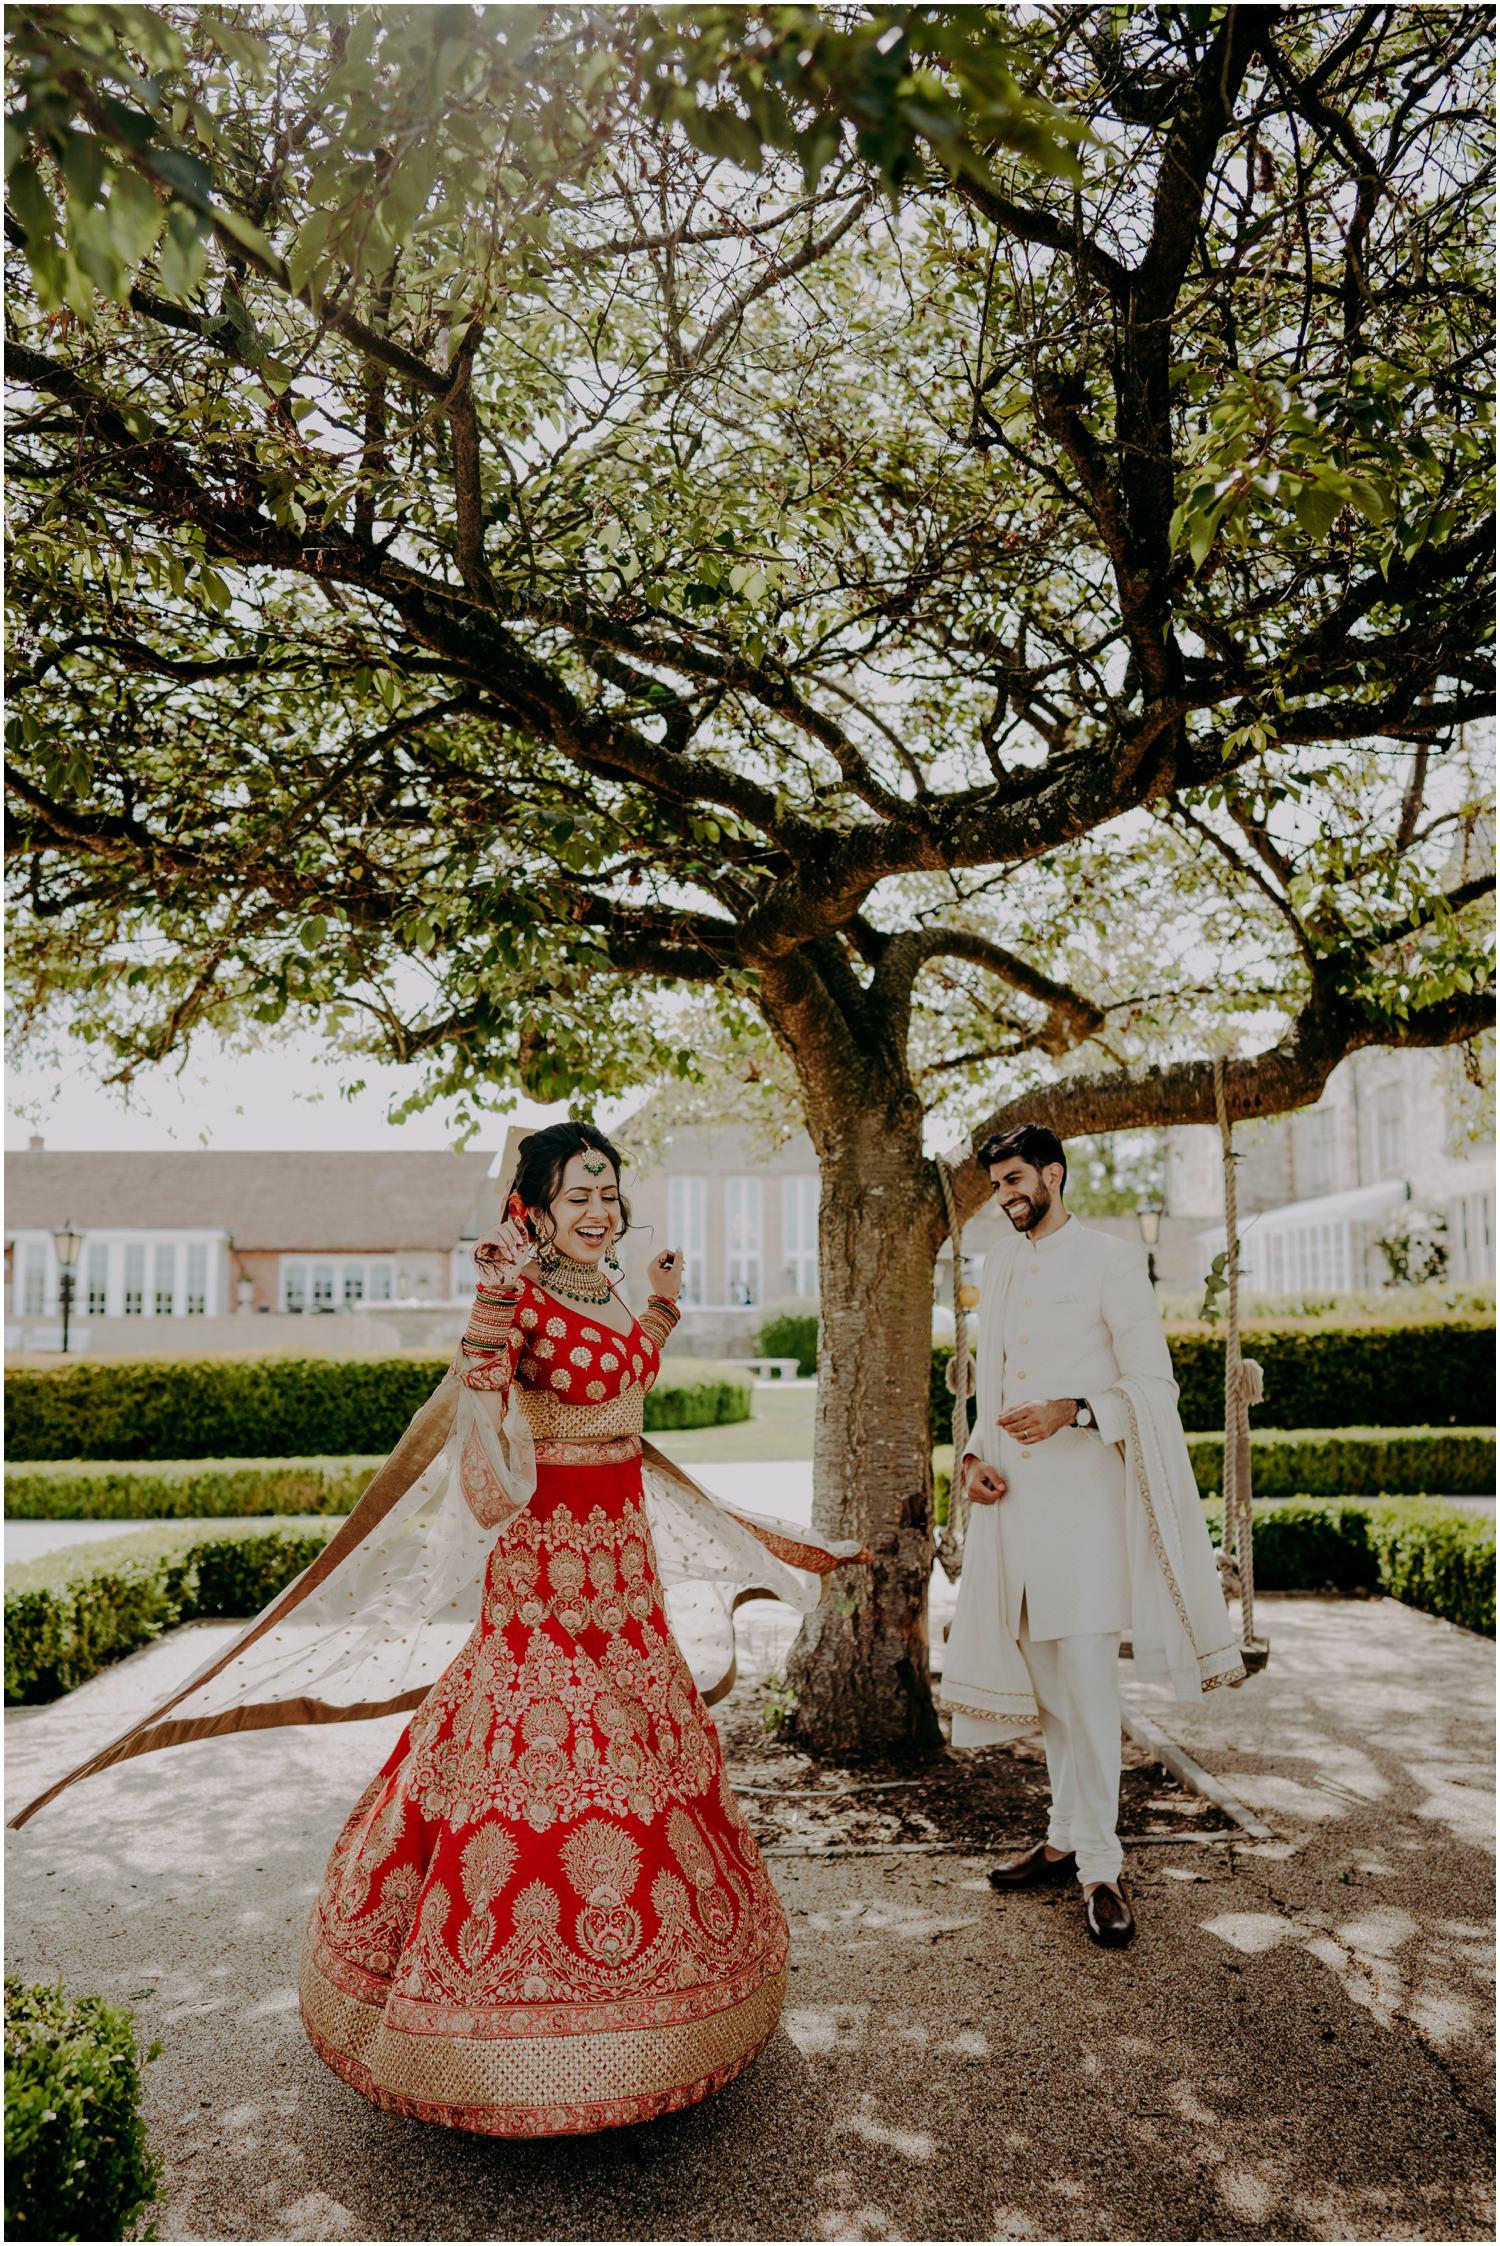 brighton alternative wedding photographer166.jpg